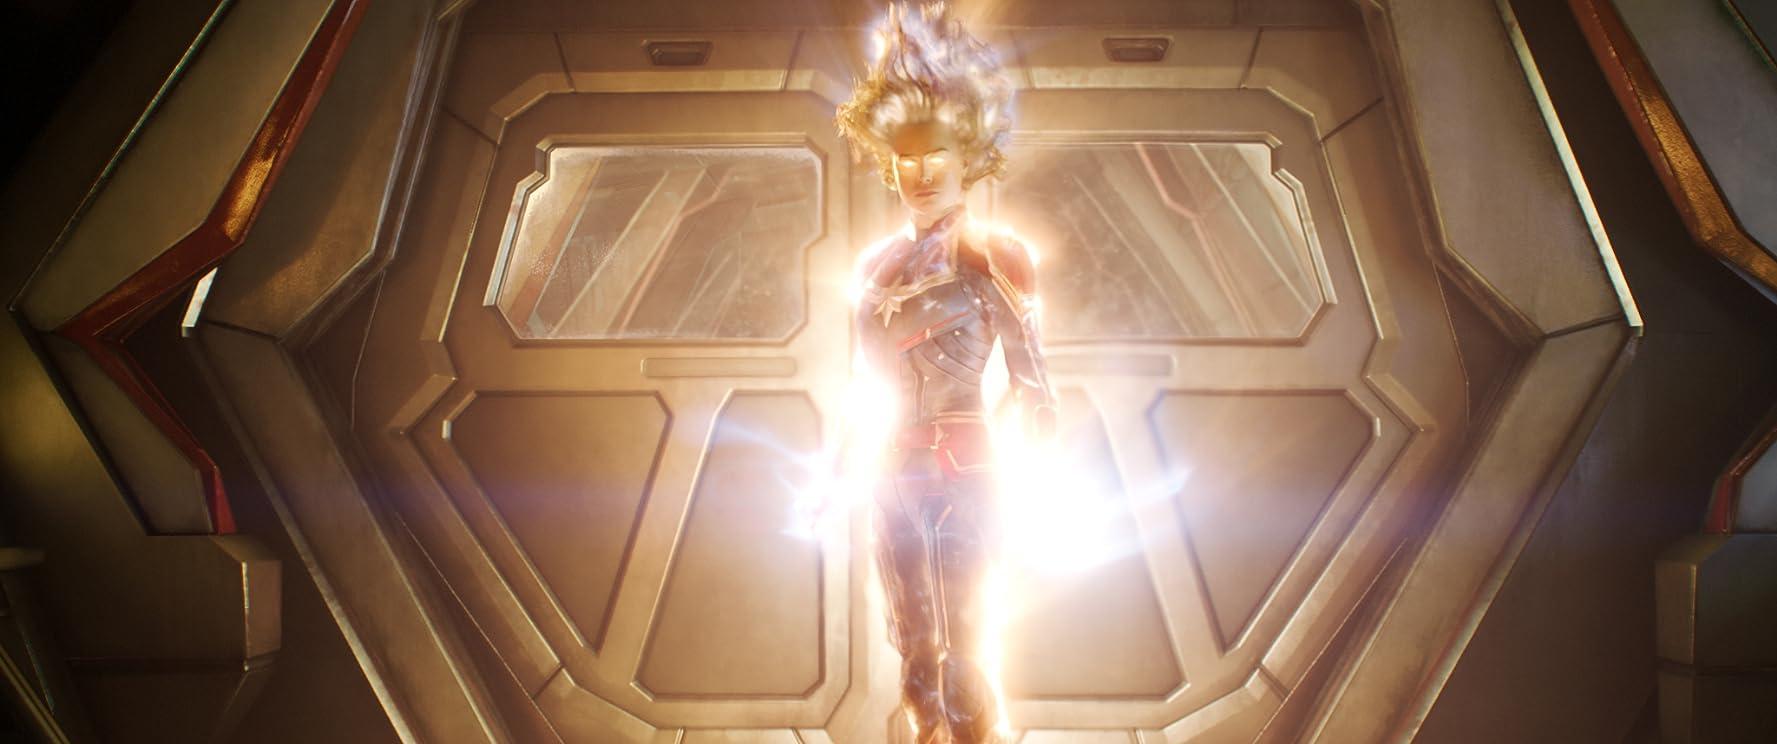 Brie Larson as Captain Marvel (2019)